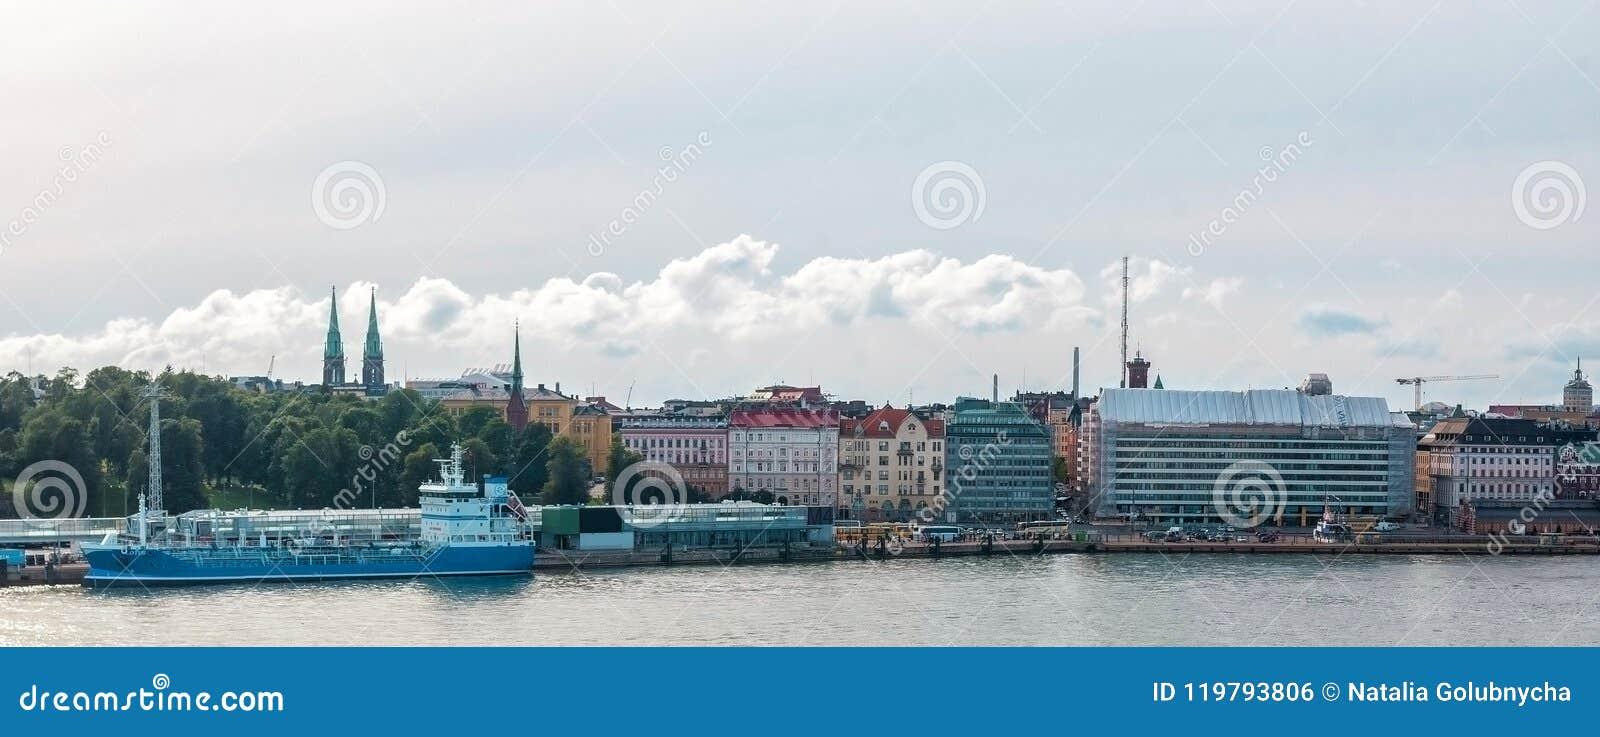 Schiff machte am Damm, Helsinki, Finnland fest